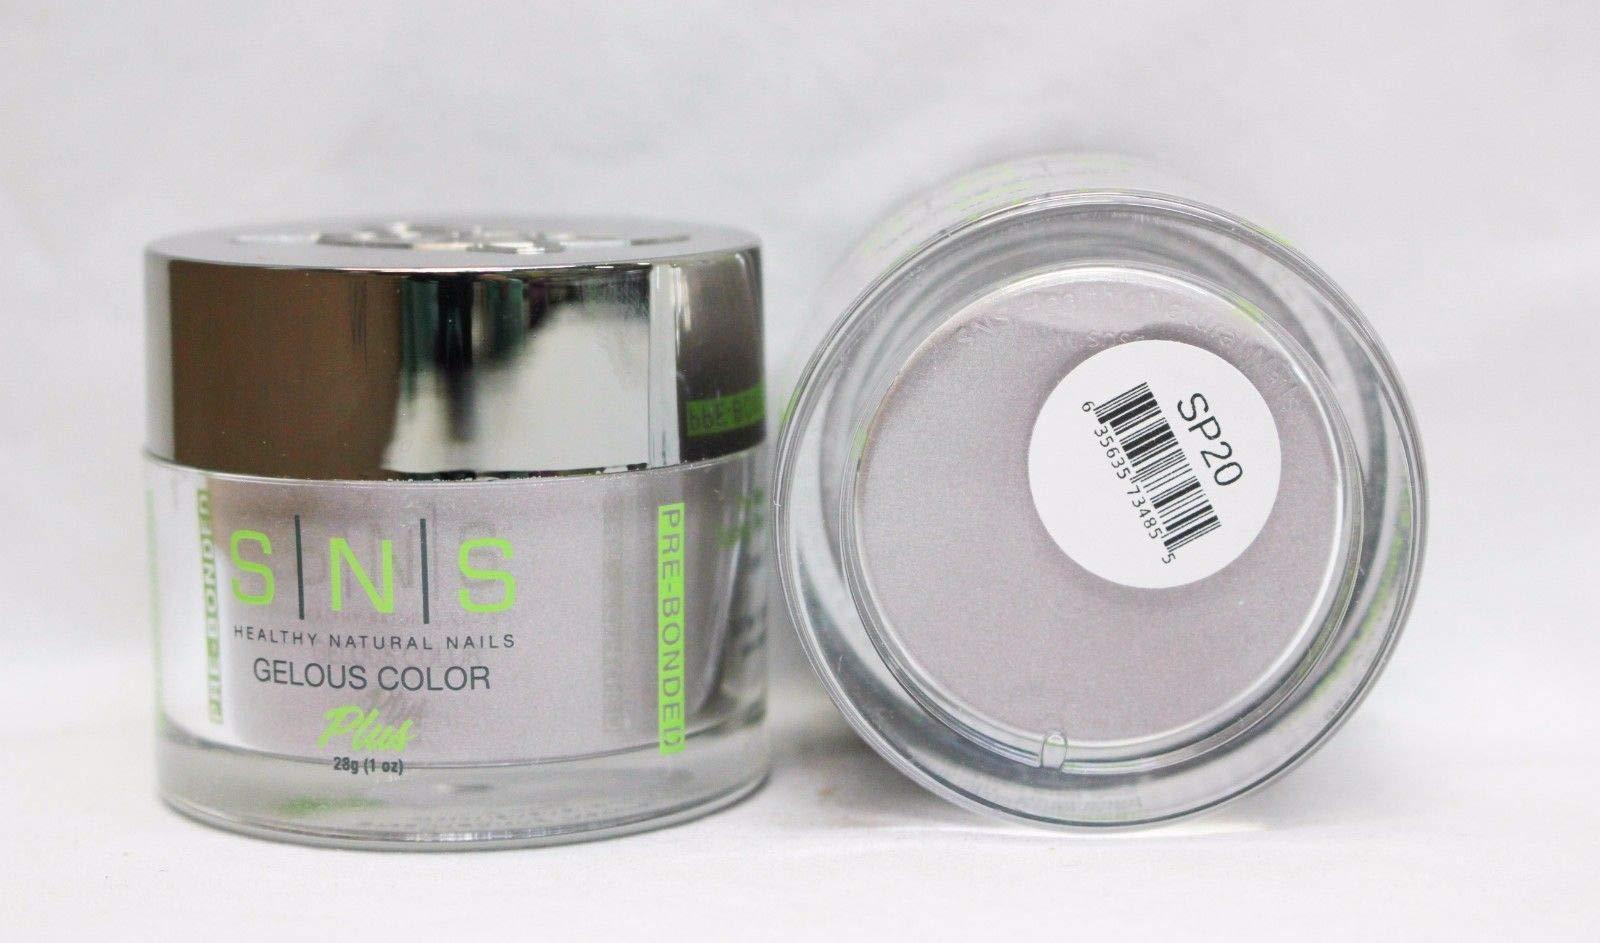 SNS Nails Dipping Powder No Liquid/Primer/UV Light, SP20 by SNS